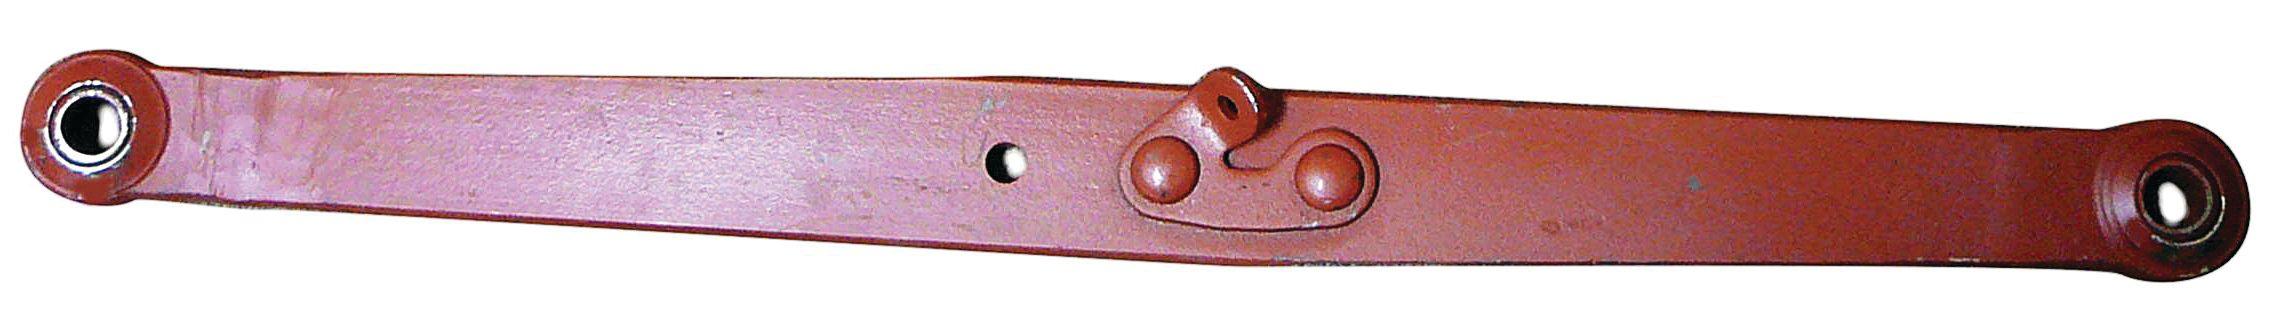 FORD NEW HOLLAND LINK ARM-RH 61415